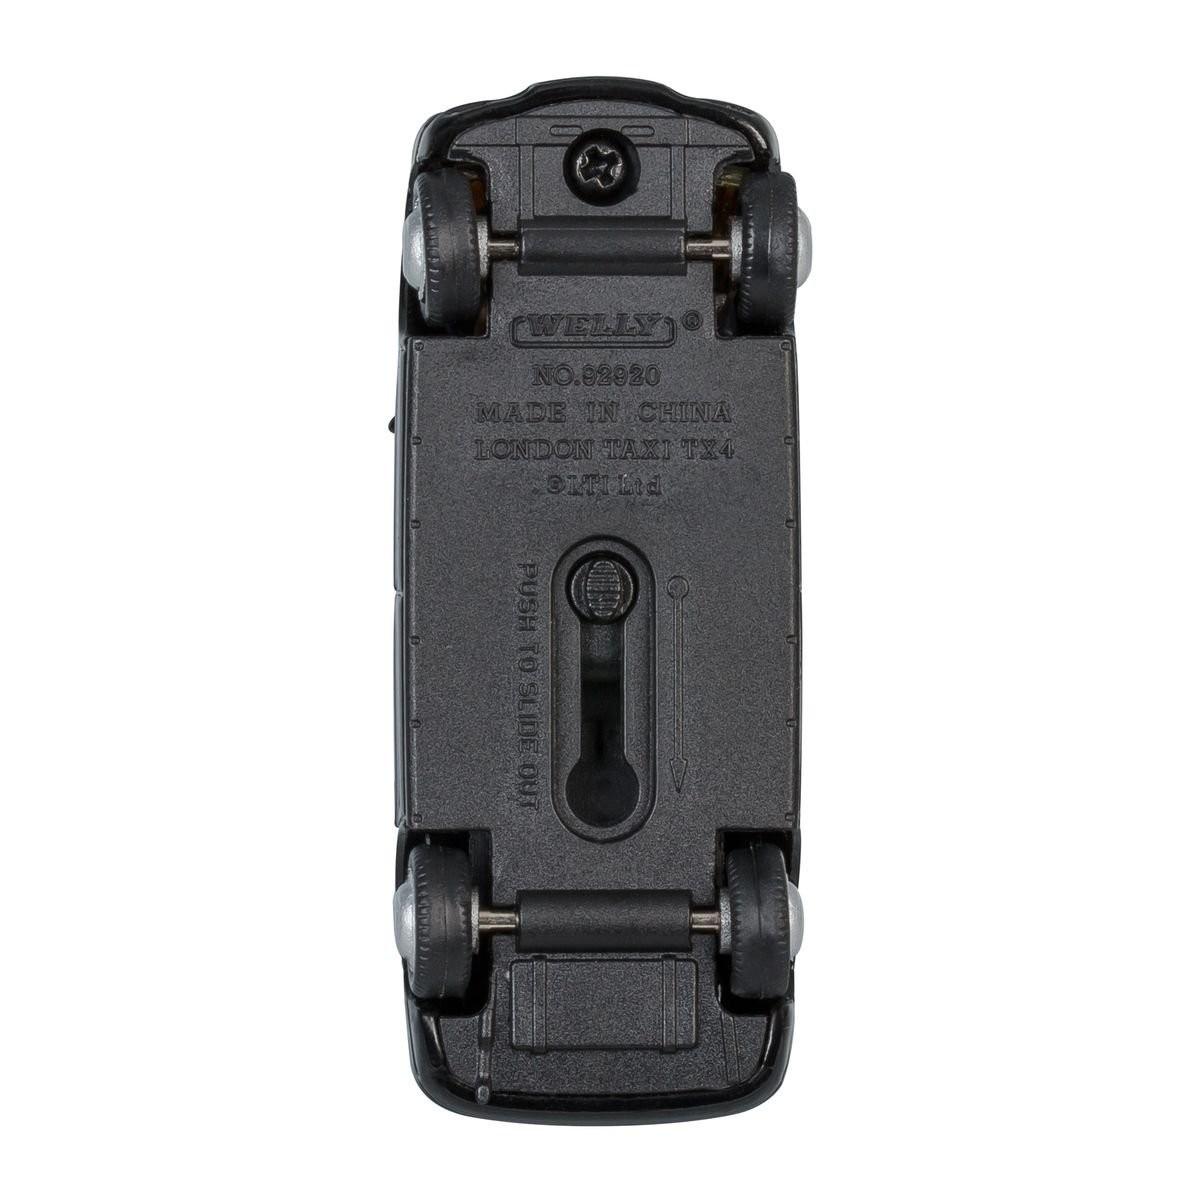 USB flash drive London Taxi TX4 1:72 BLACK 16GB, View 13